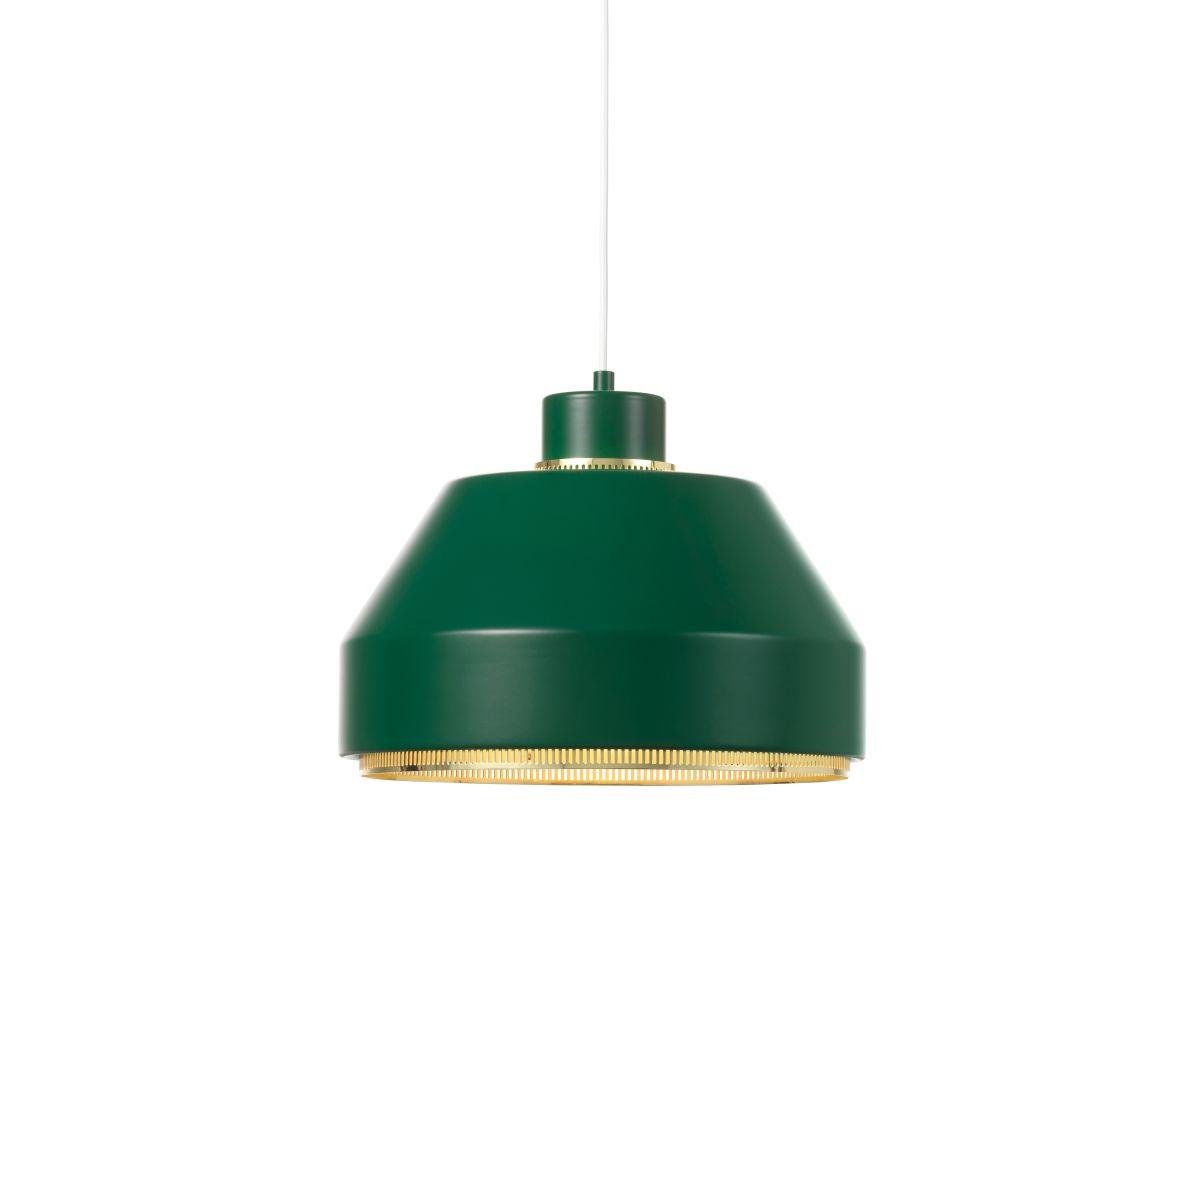 Pendant-Light-AMA500-green-brass-light-on_F-2859739